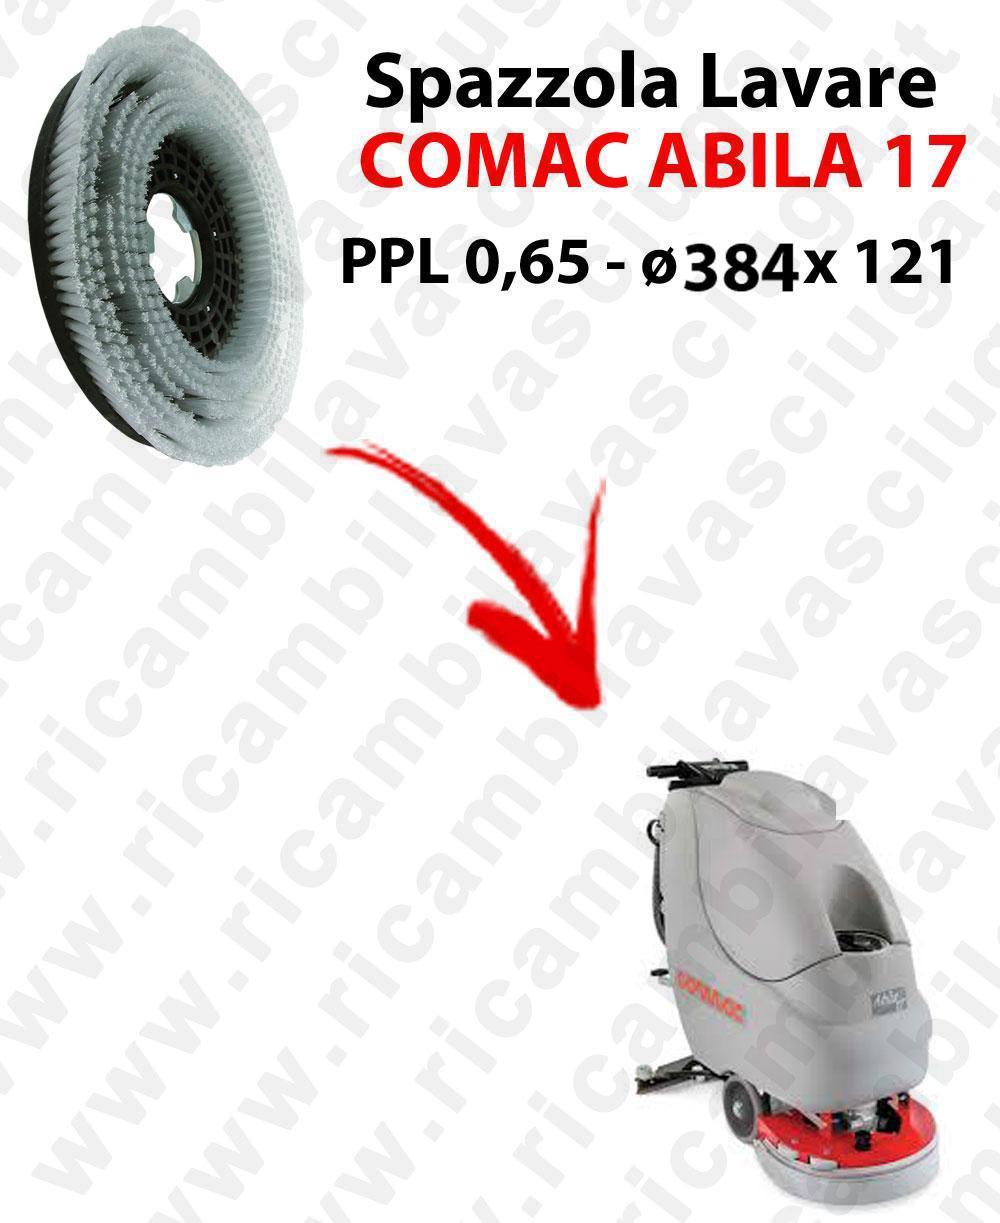 Cleaning Brush for scrubber dryer COMAC ABILA 17. Model: PPL 0,65  ⌀384 X 121